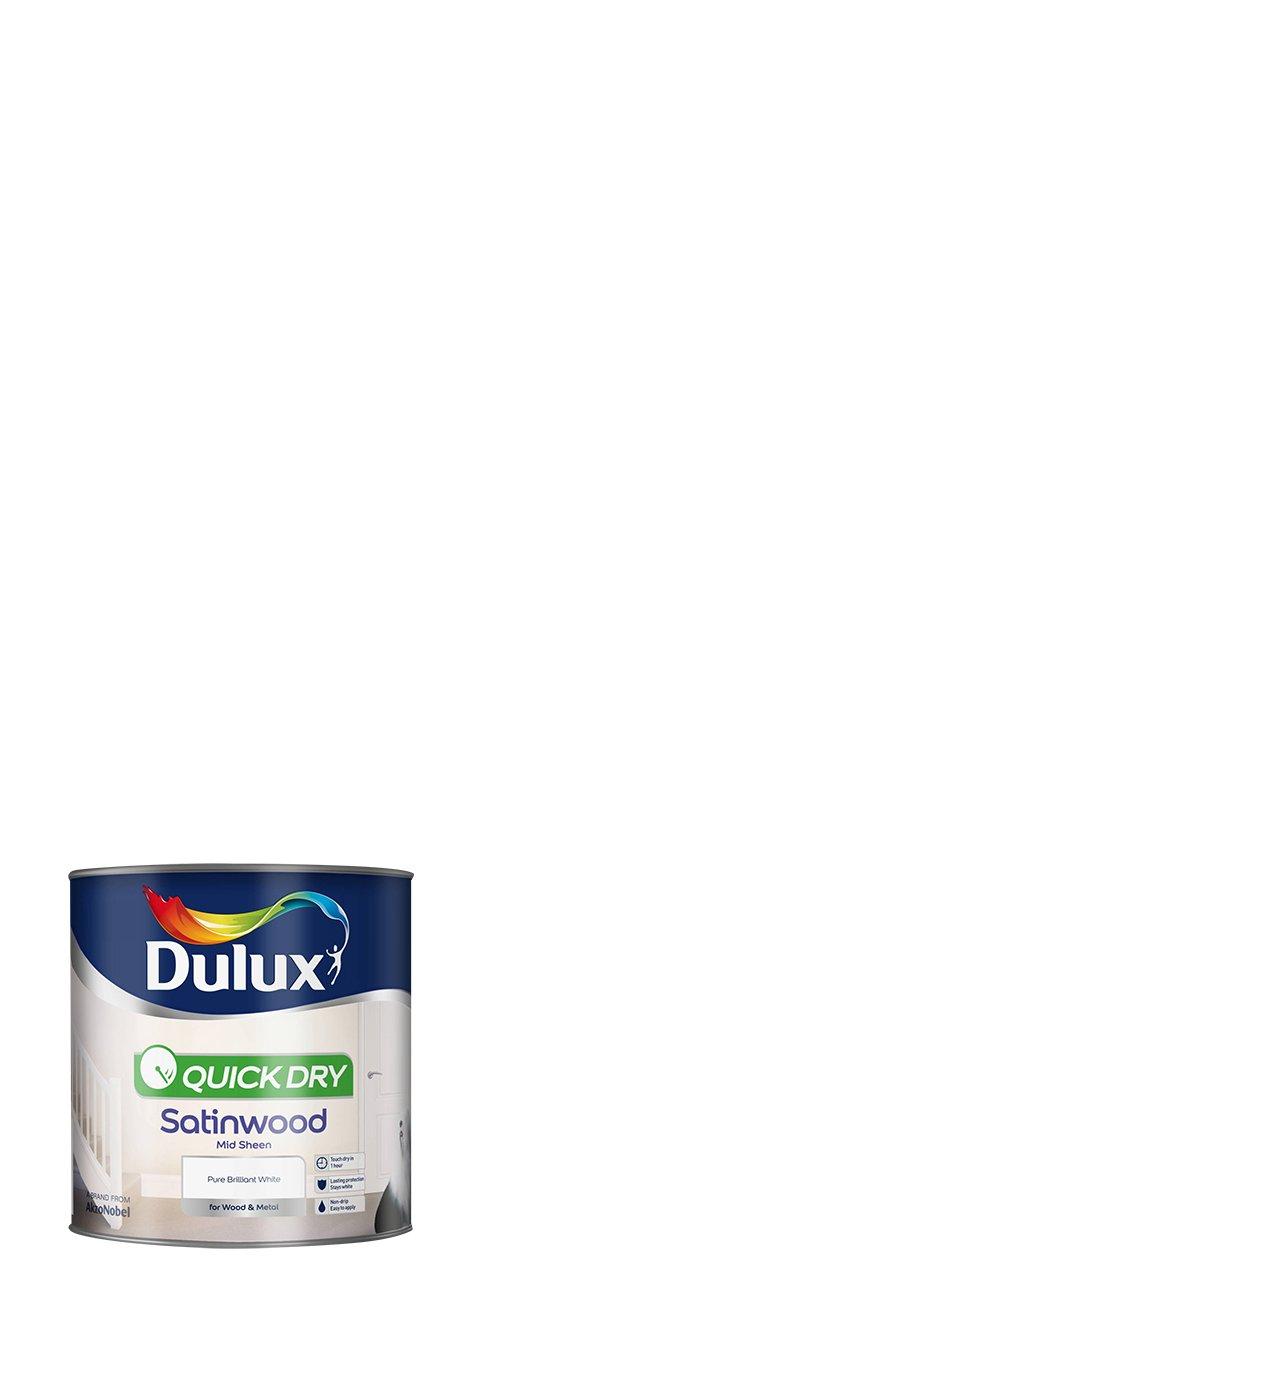 Dulux Quick Dry Satinwood Paint Pure Brilliant White Review